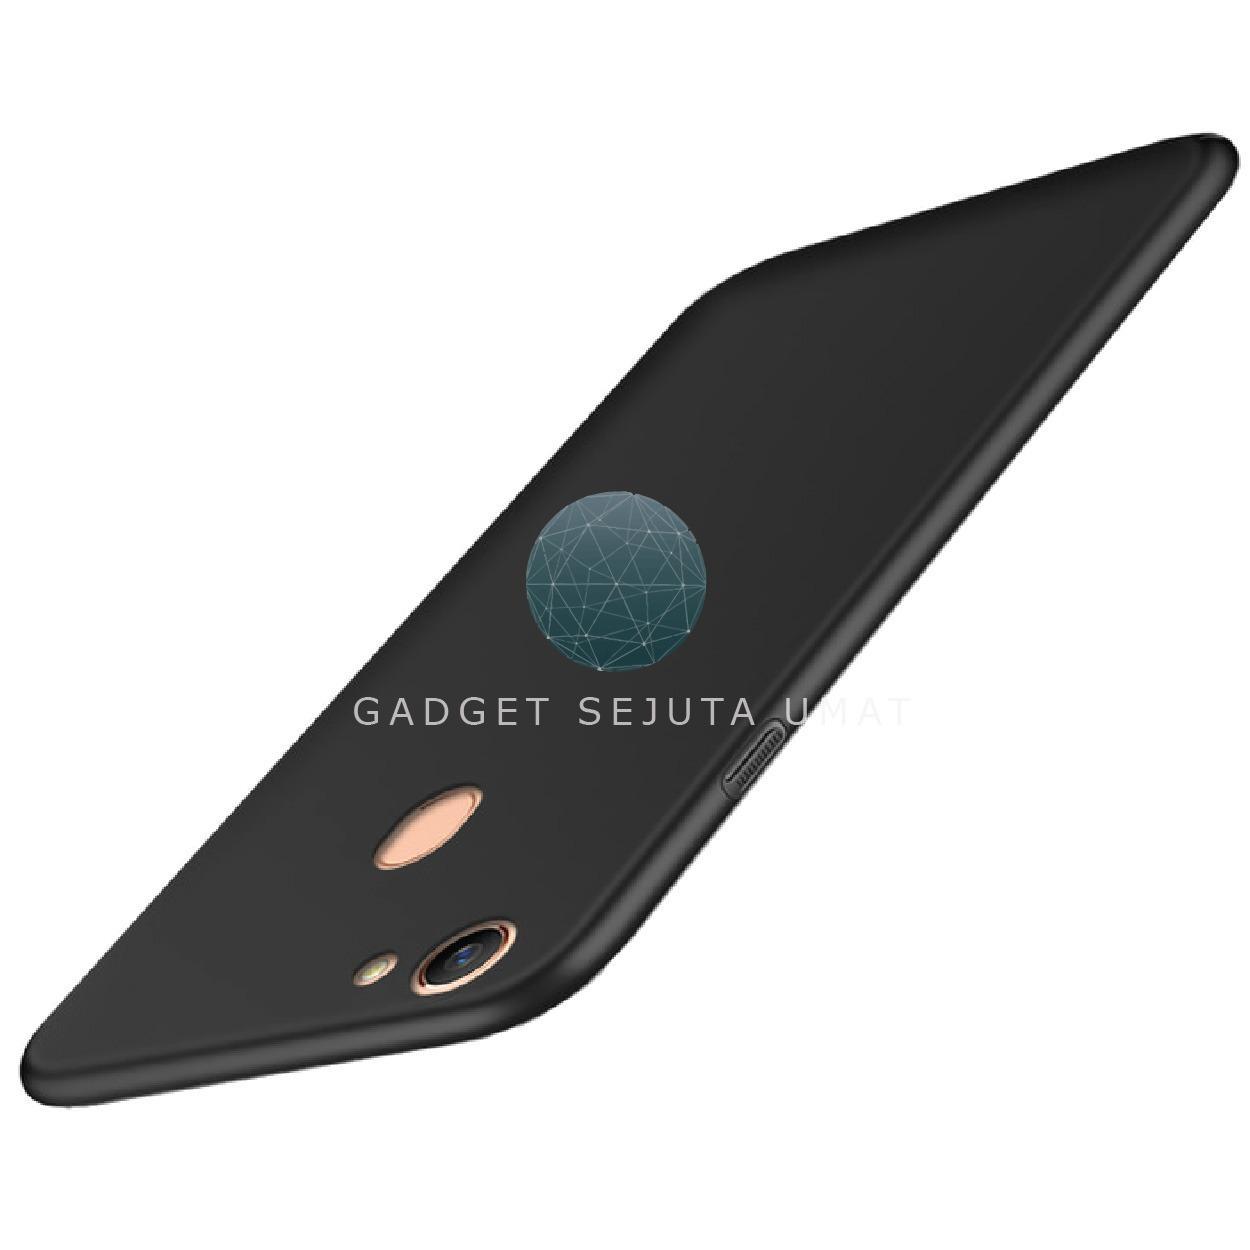 Harga Gsu Oppo F5 Baby Skin Ultra Thin Hard Case Termahal